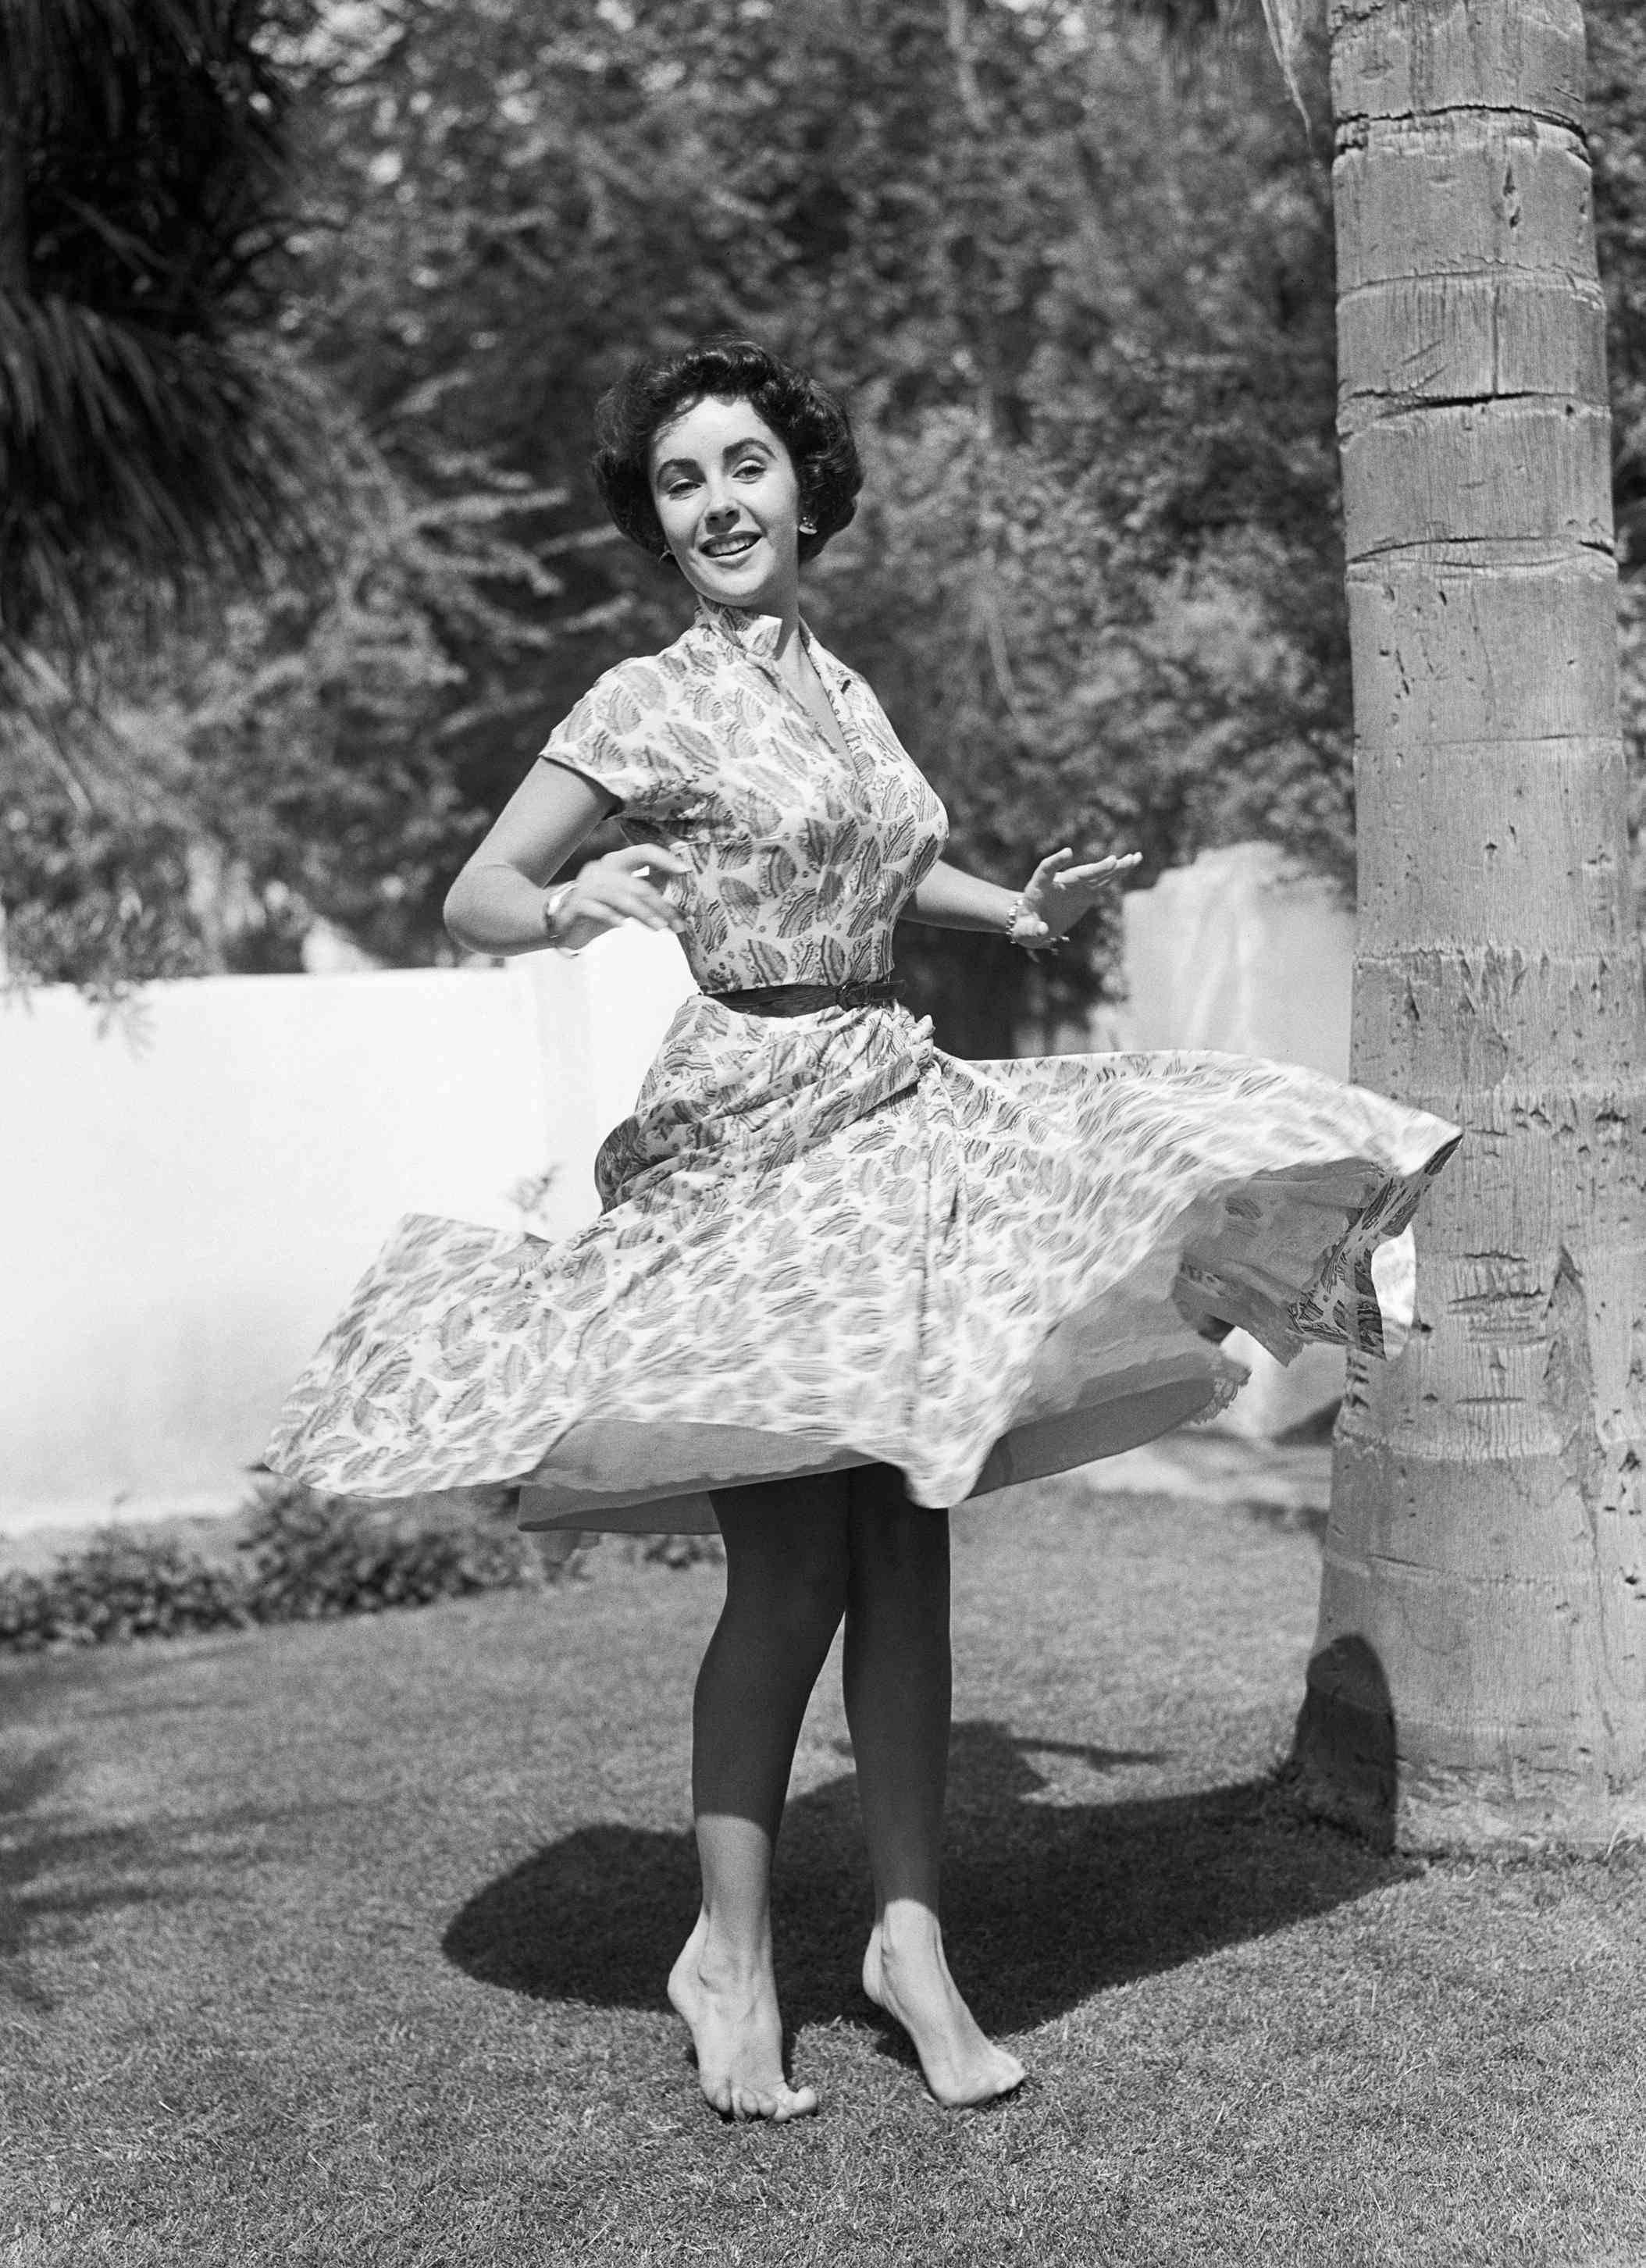 https://pics.wikifeet.com/Elizabeth-Taylor-Feet-3993063.jpg